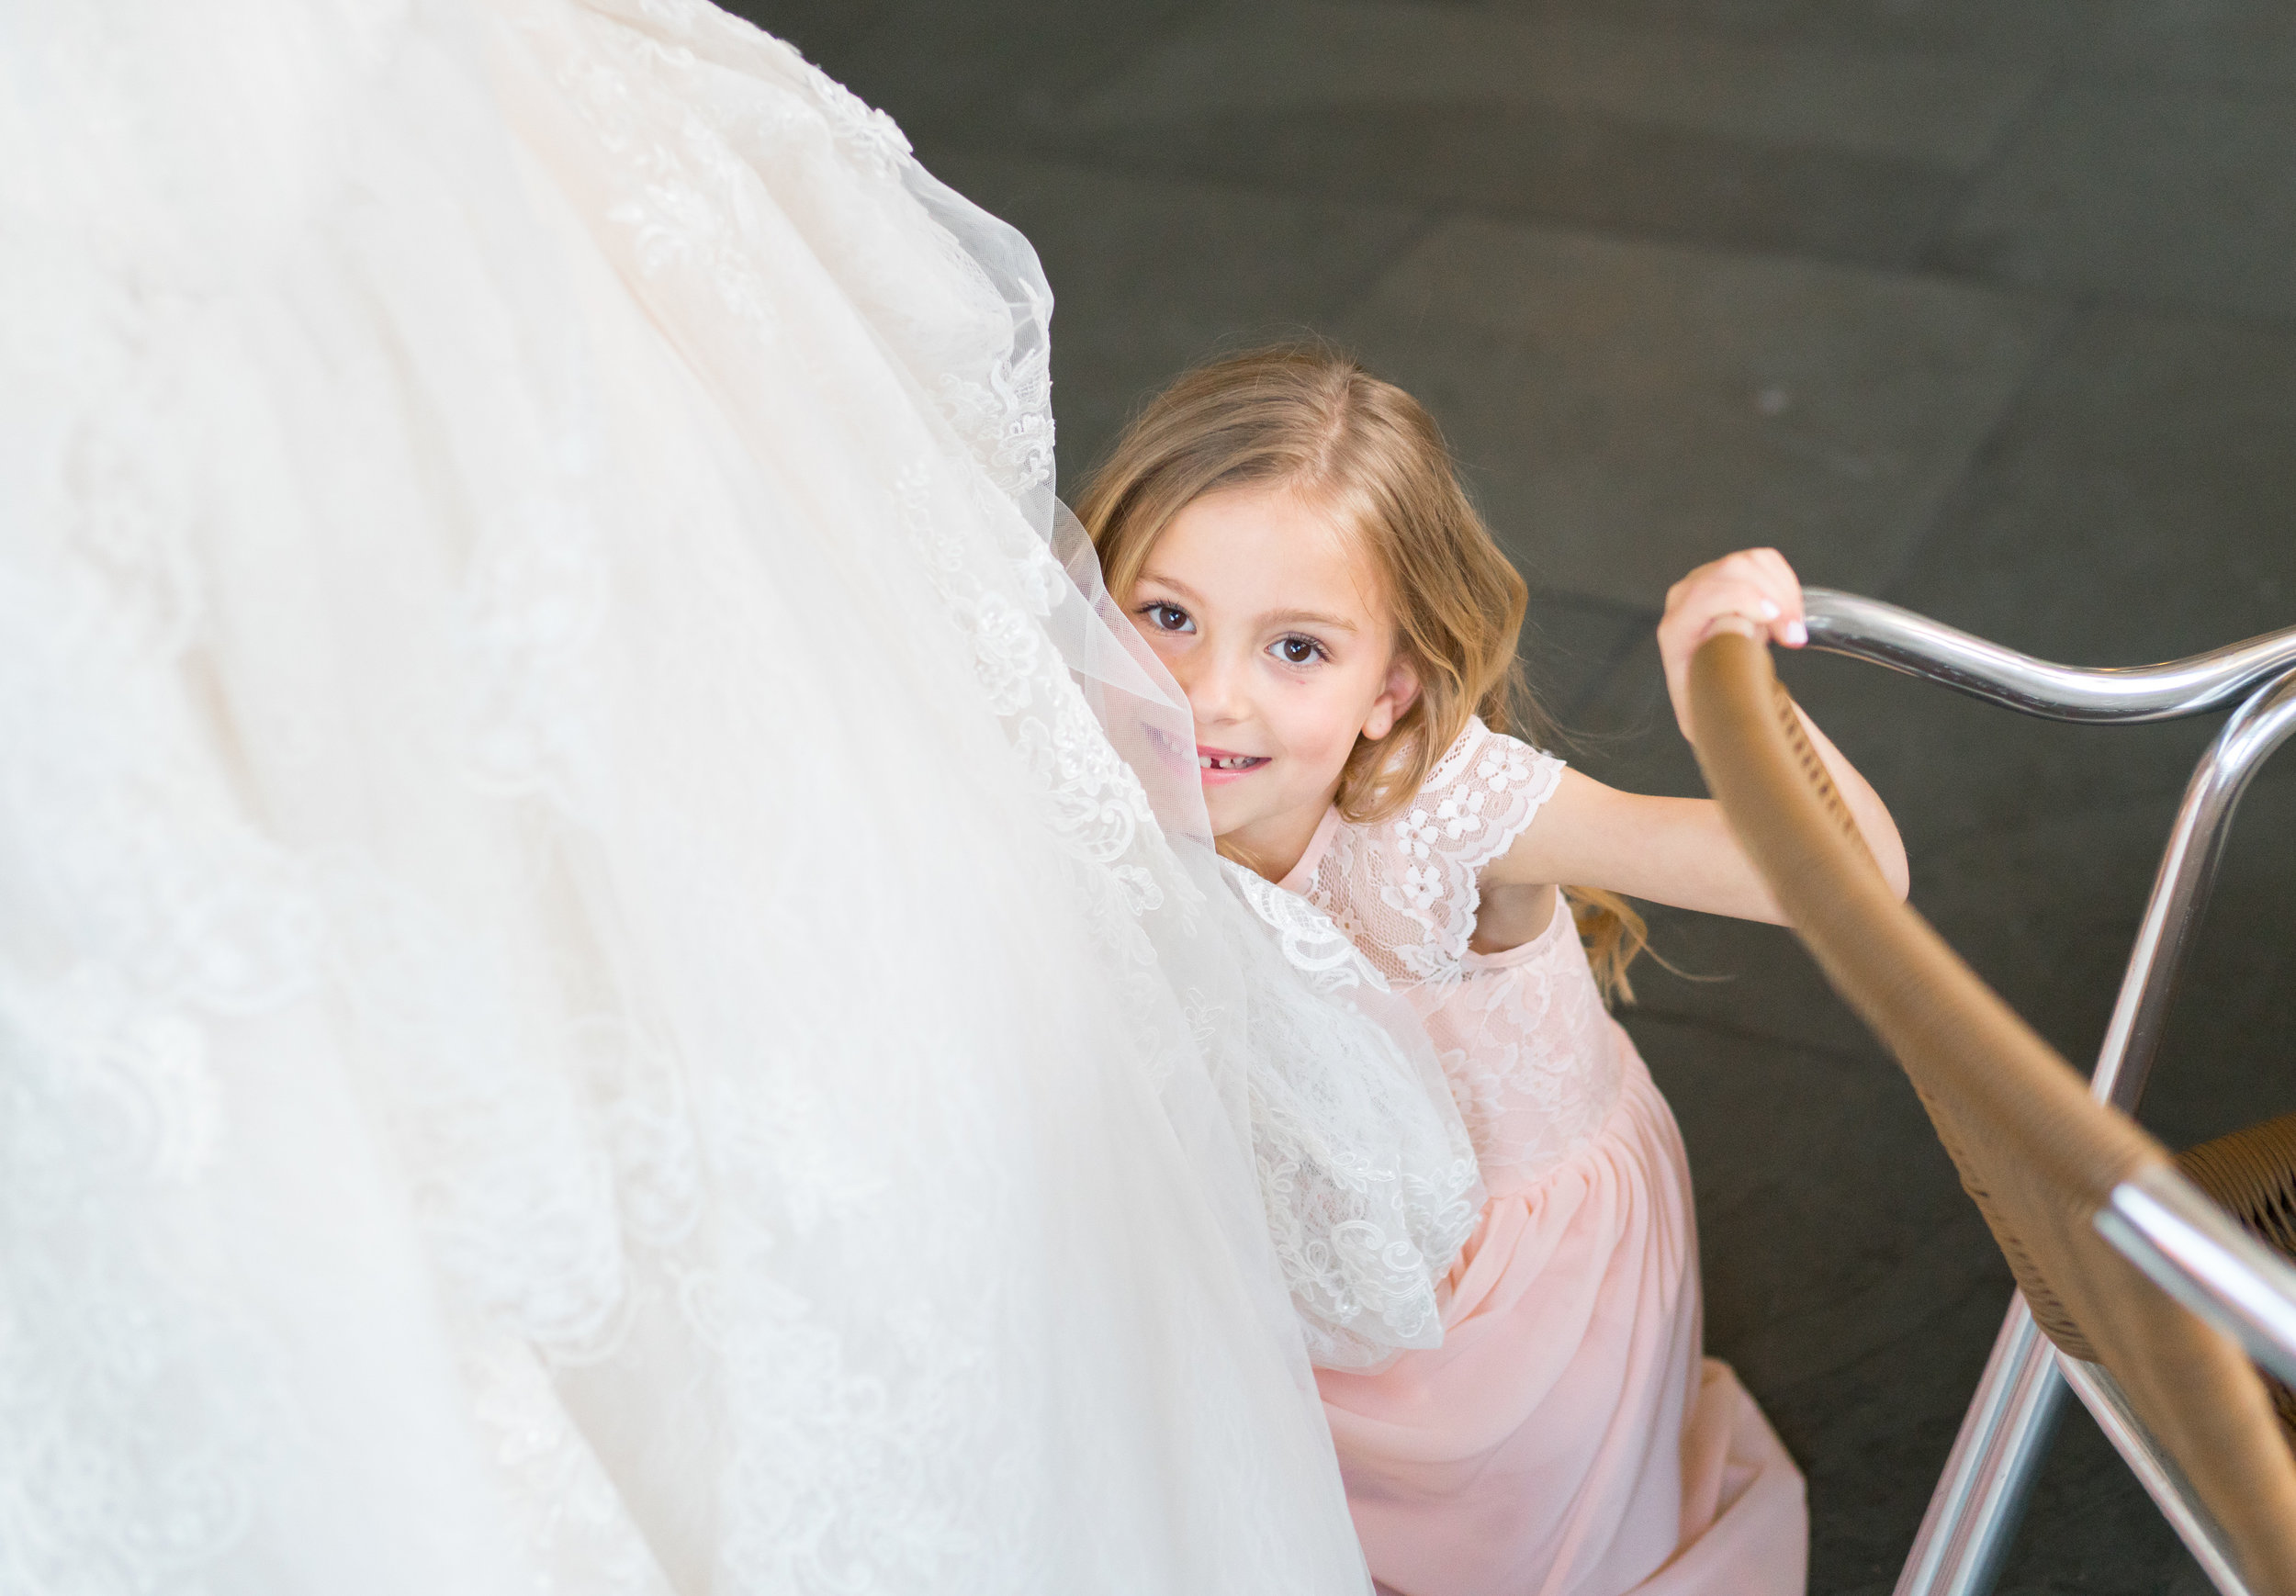 Mother daughter at bethesda wedding Oleg Cassini gown CWG749